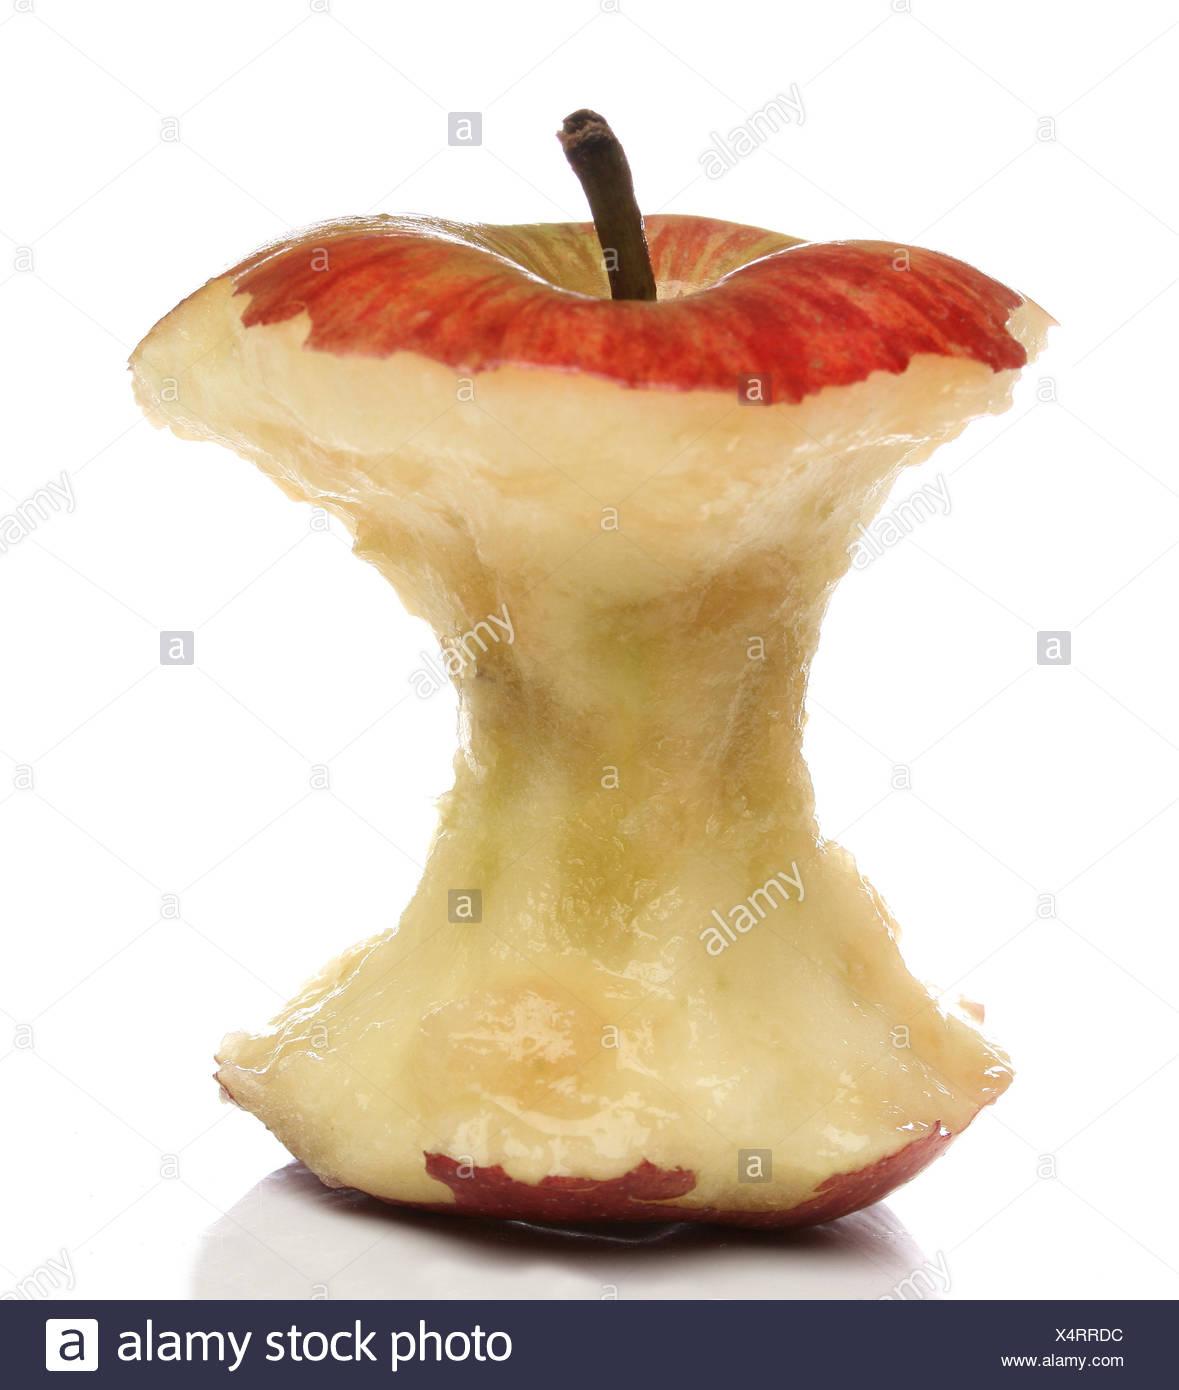 fruit consume eaten - Stock Image